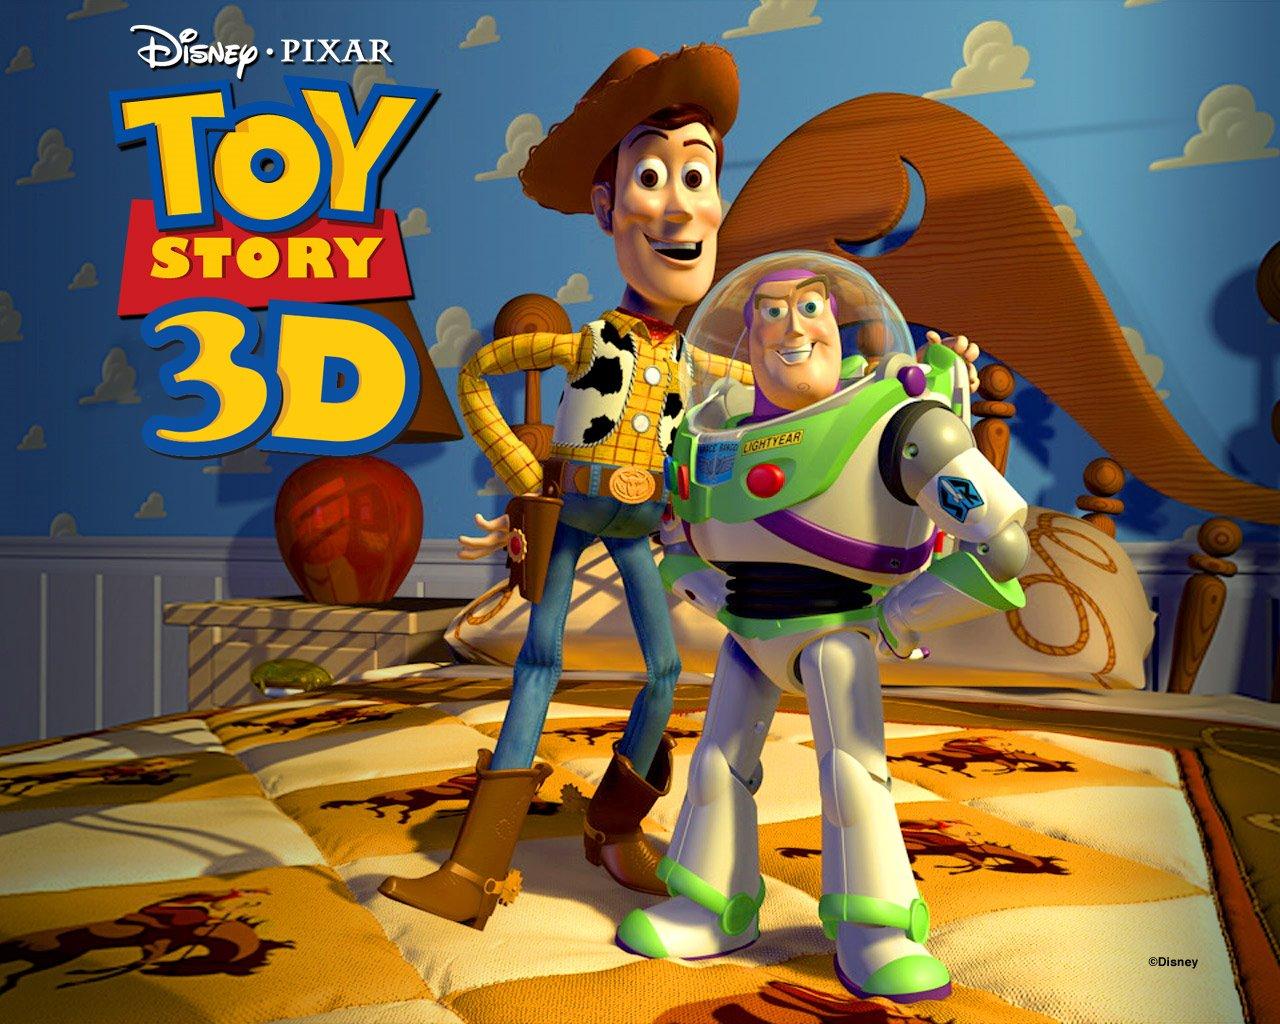 http://1.bp.blogspot.com/_l1OxgpBIEA0/TBRcwBZ-2UI/AAAAAAAAABU/gGuBK9OIFdY/s1600/toy-story-3d1.jpg